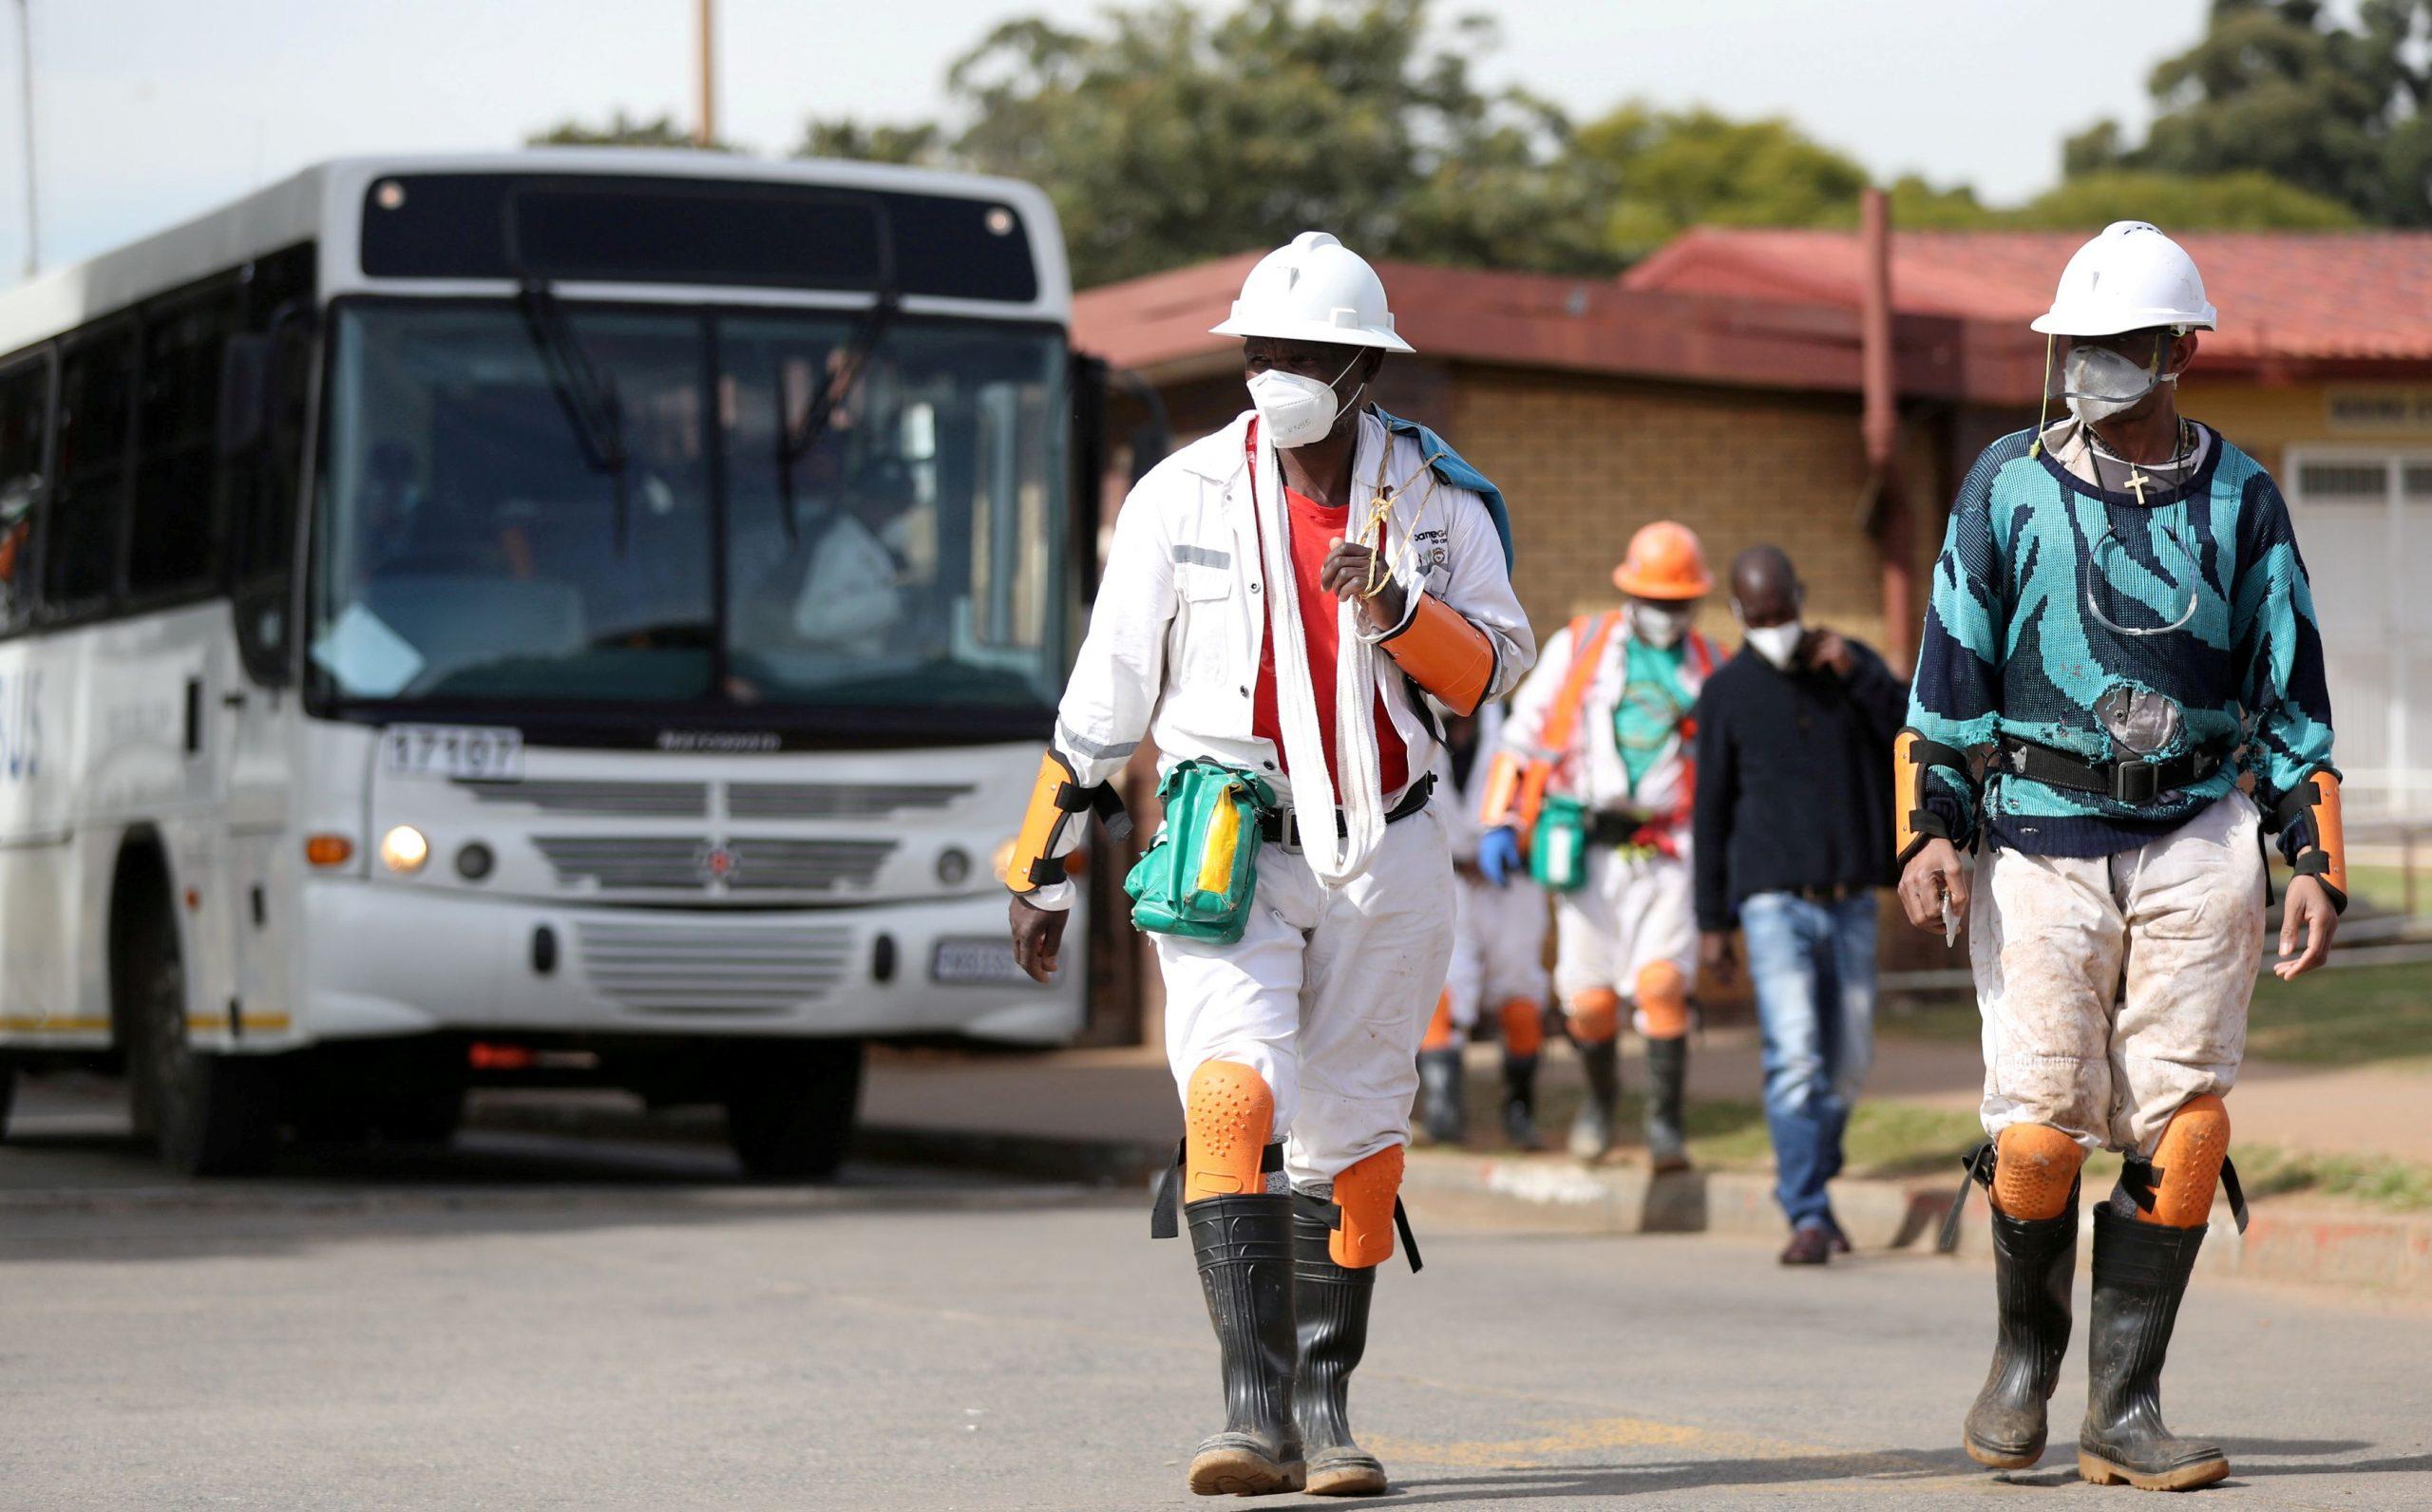 ffoto: REUTERS/Siphiwe Sibeko